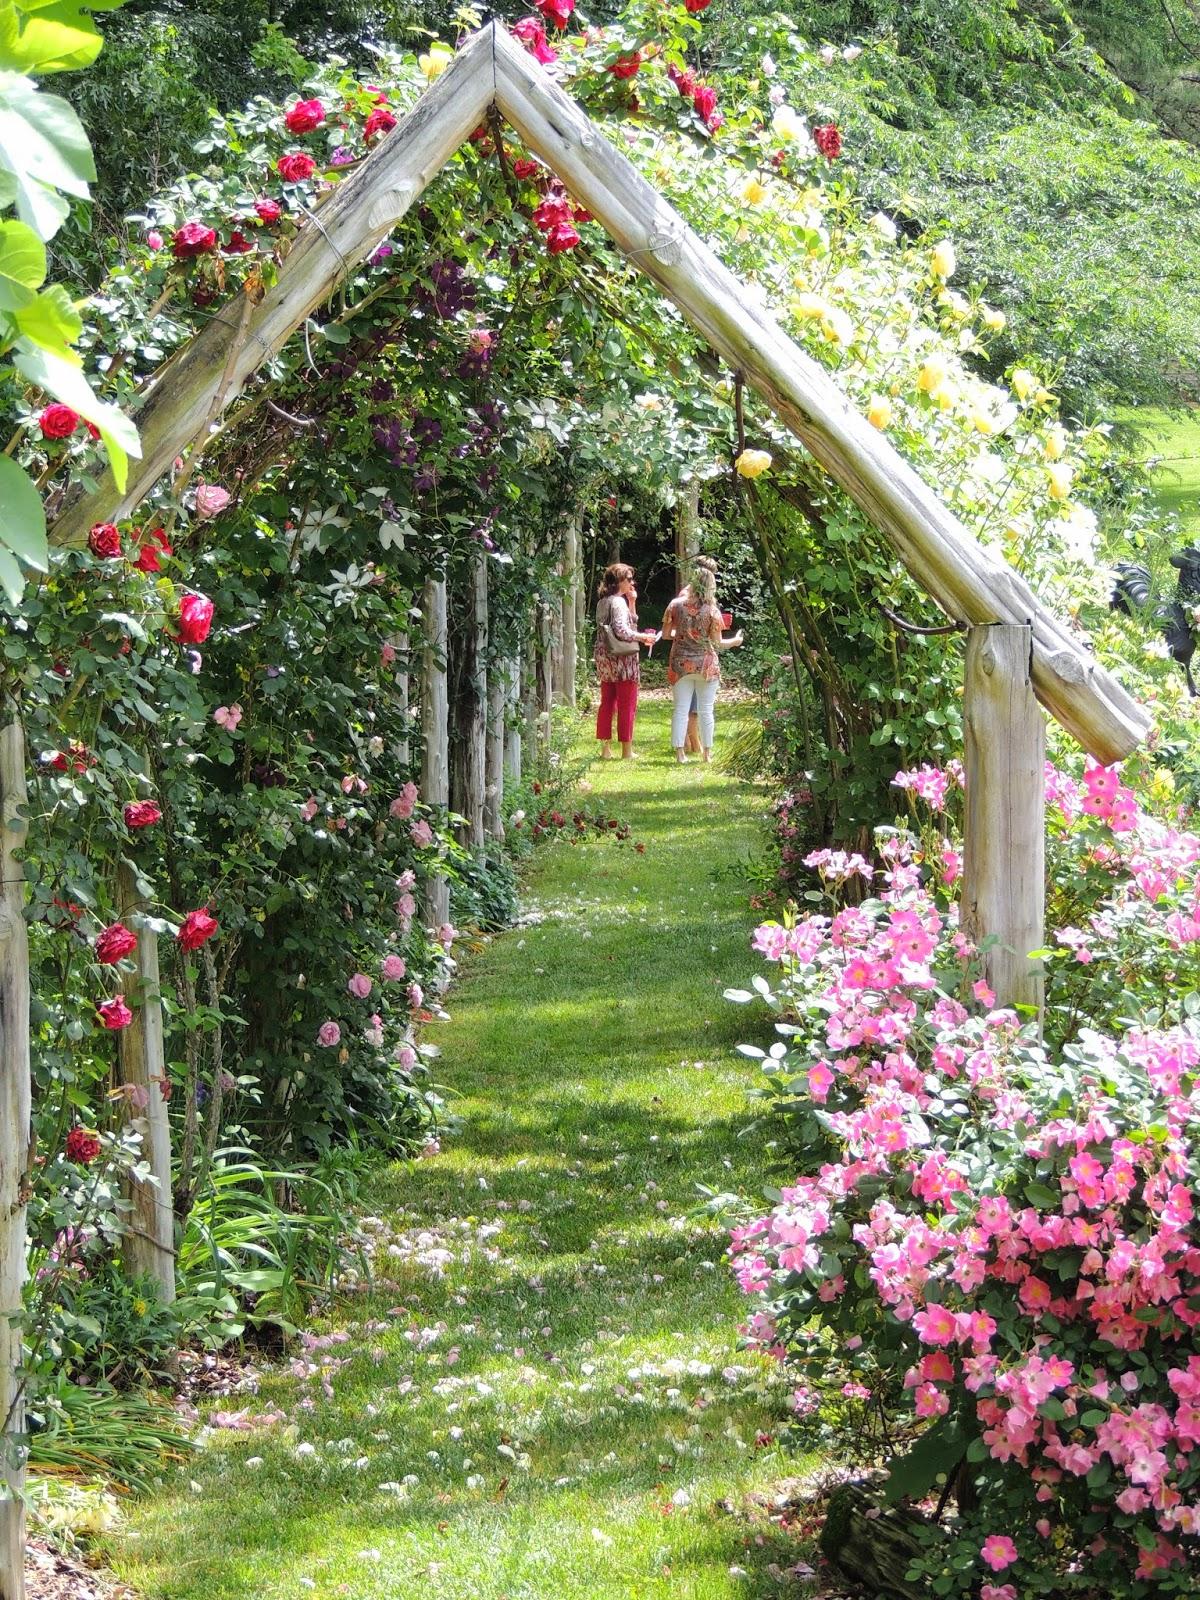 Garden Walk Garden Talk: Durham Council Of Garden Clubs: Walk, Talk And Gawk: Host